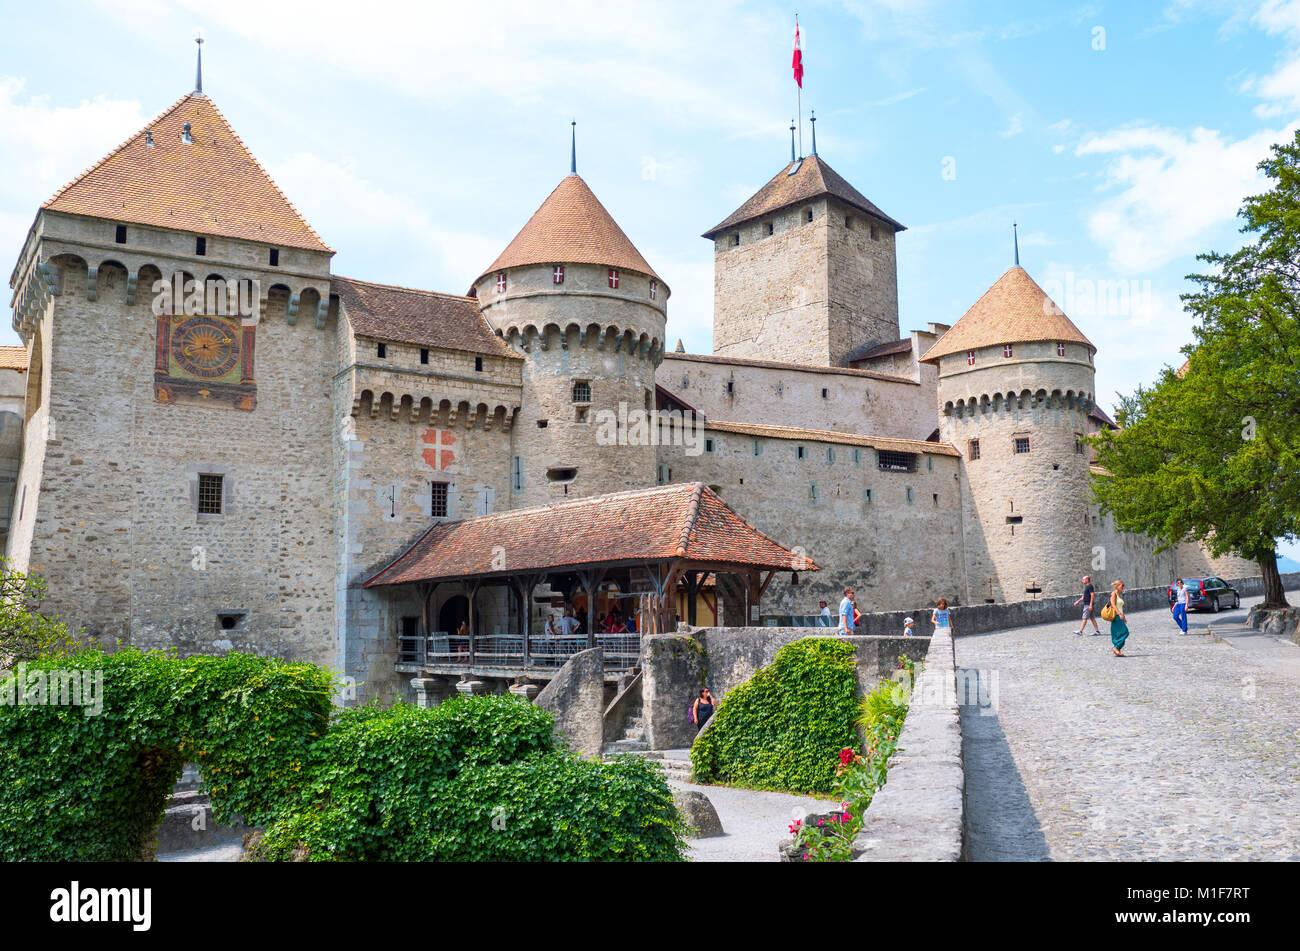 Montreux, Switzerland,  The Chillon castle on the Leman lake - Stock Image